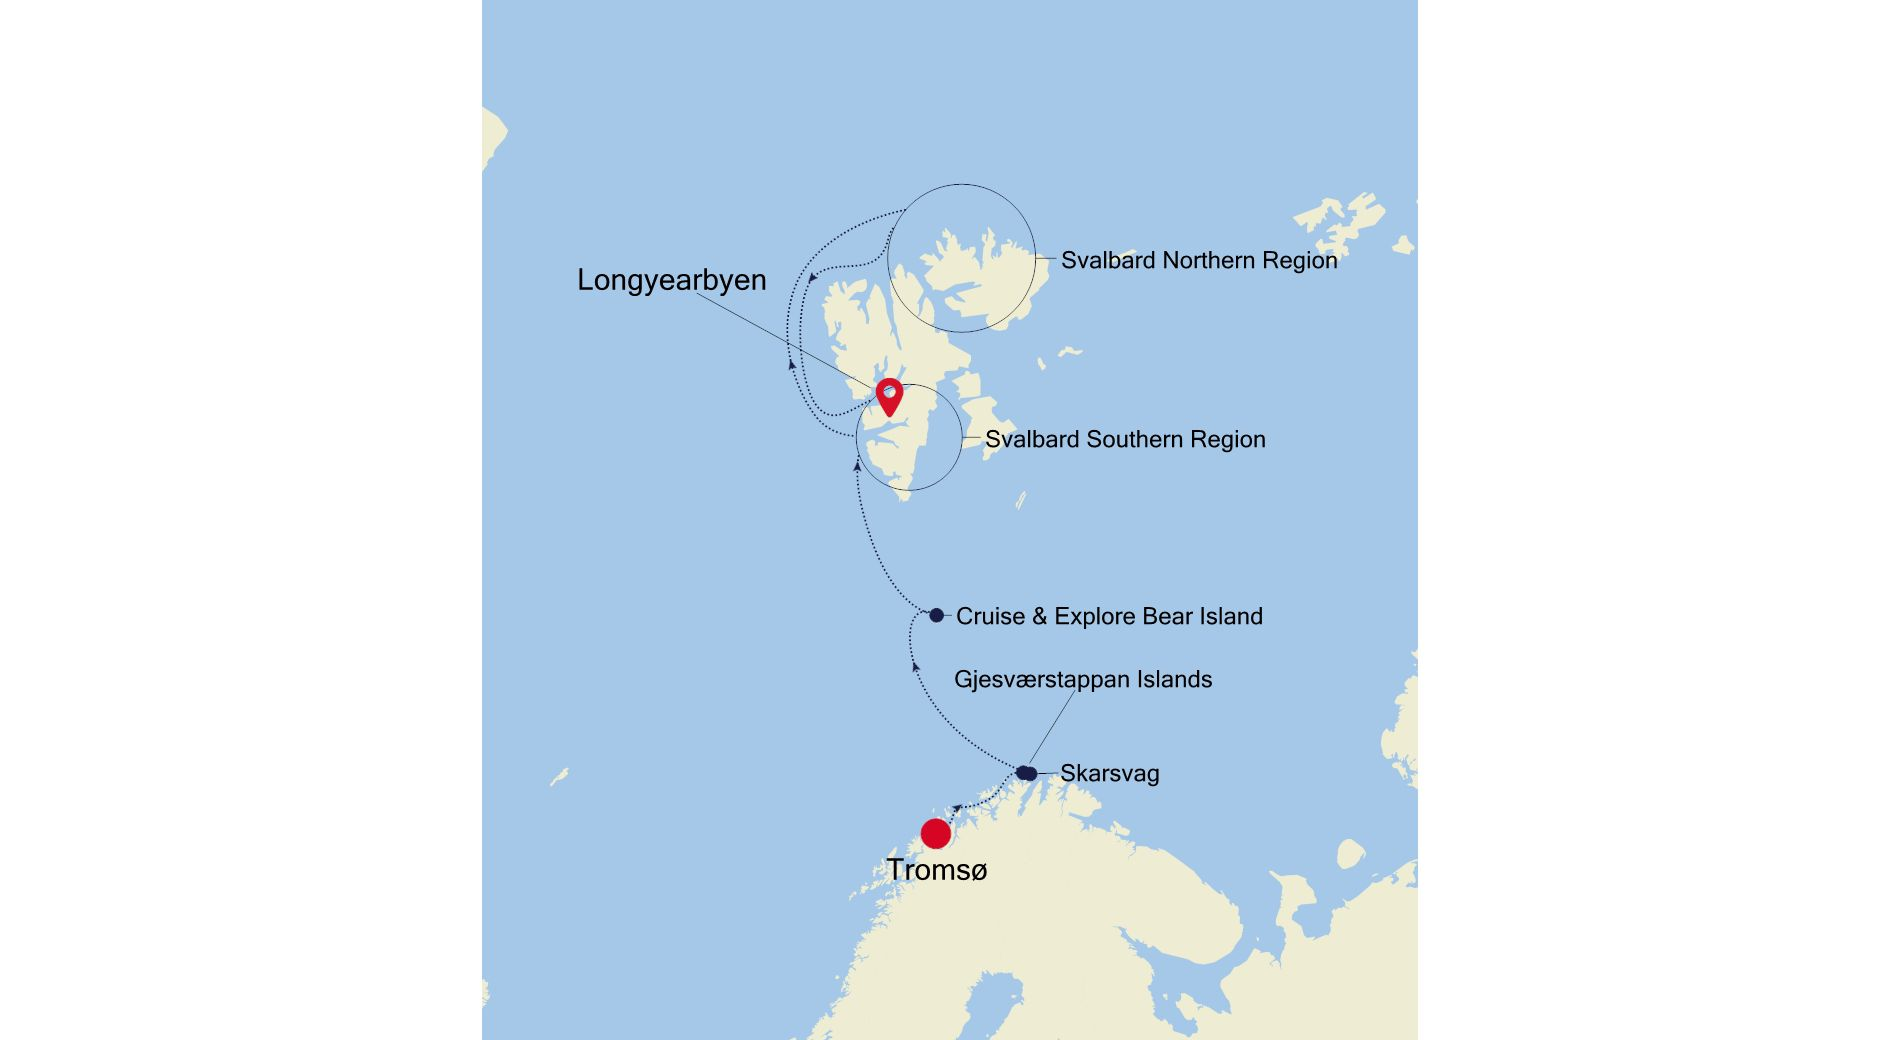 E4210626010 - Tromsø to Longyearbyen